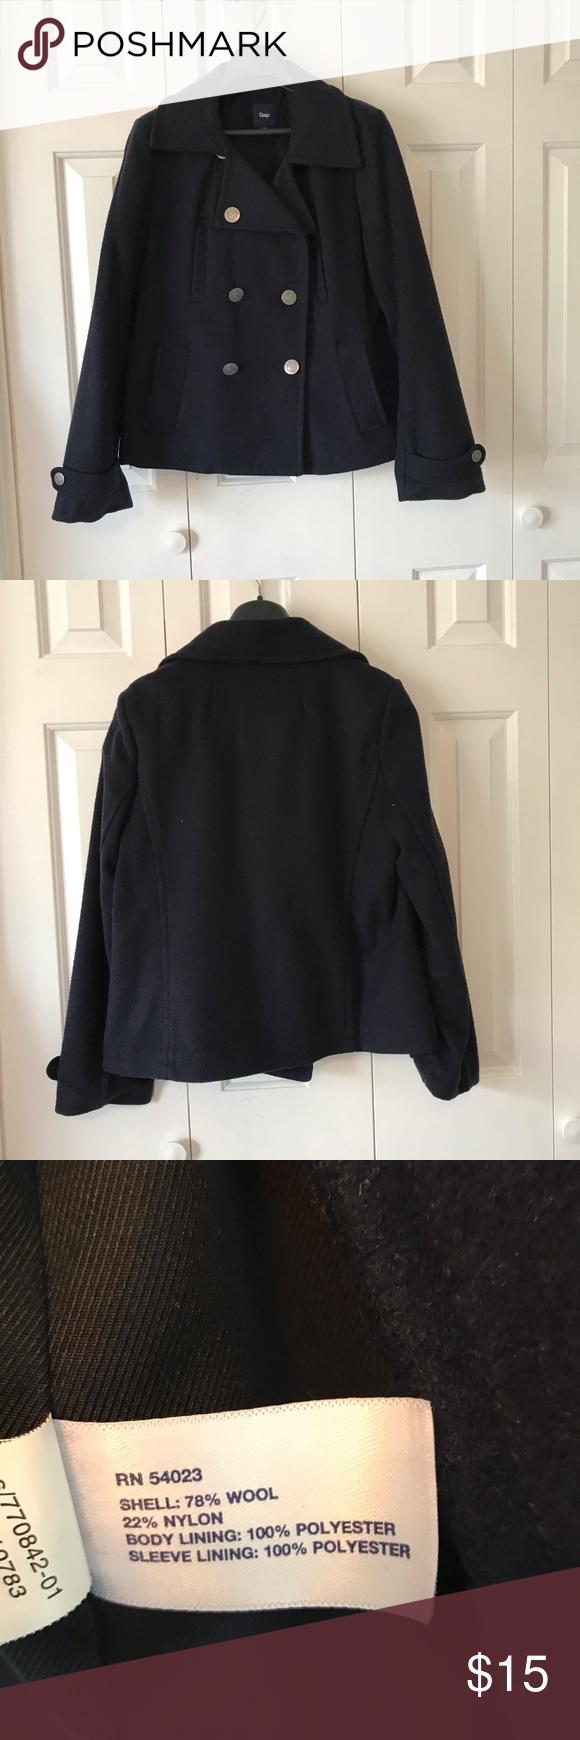 Gap Pea Coat Clothes Design Fashion Colorful Coat [ 1740 x 580 Pixel ]